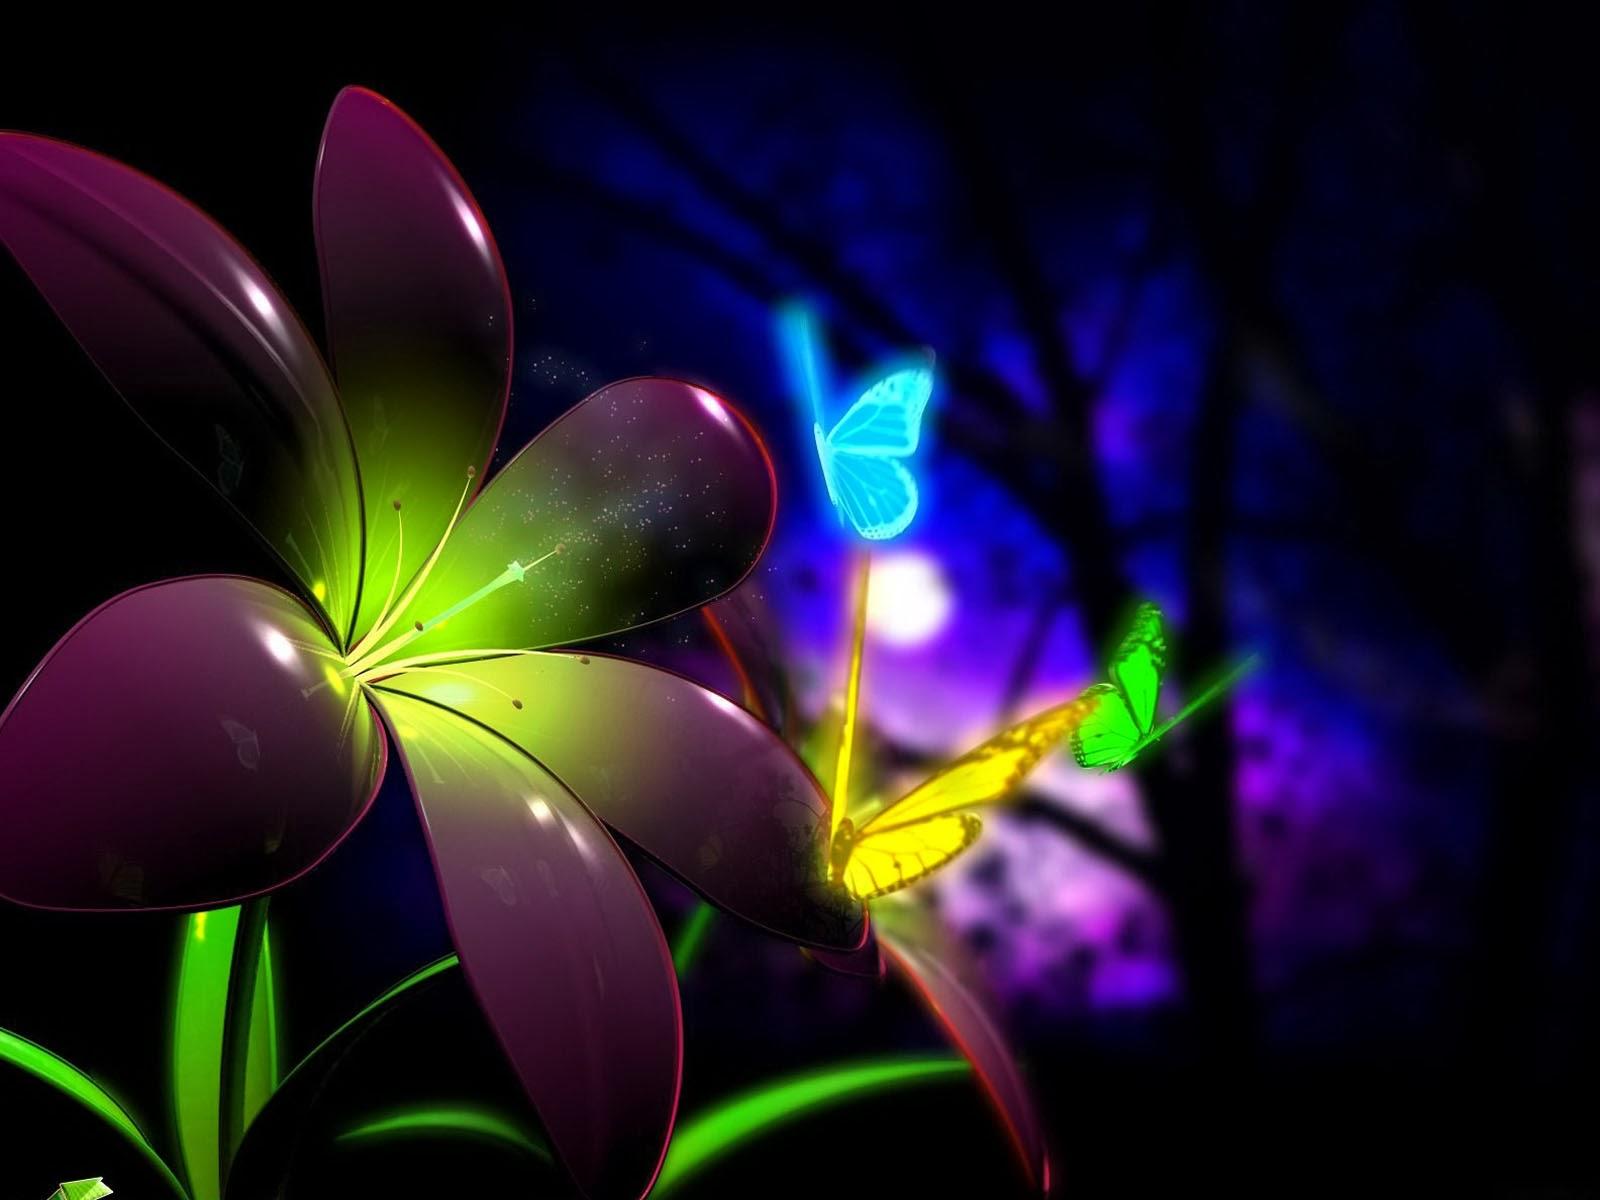 3d flowers wallpapers top wallpaper desktop for Best 3d wallpaper